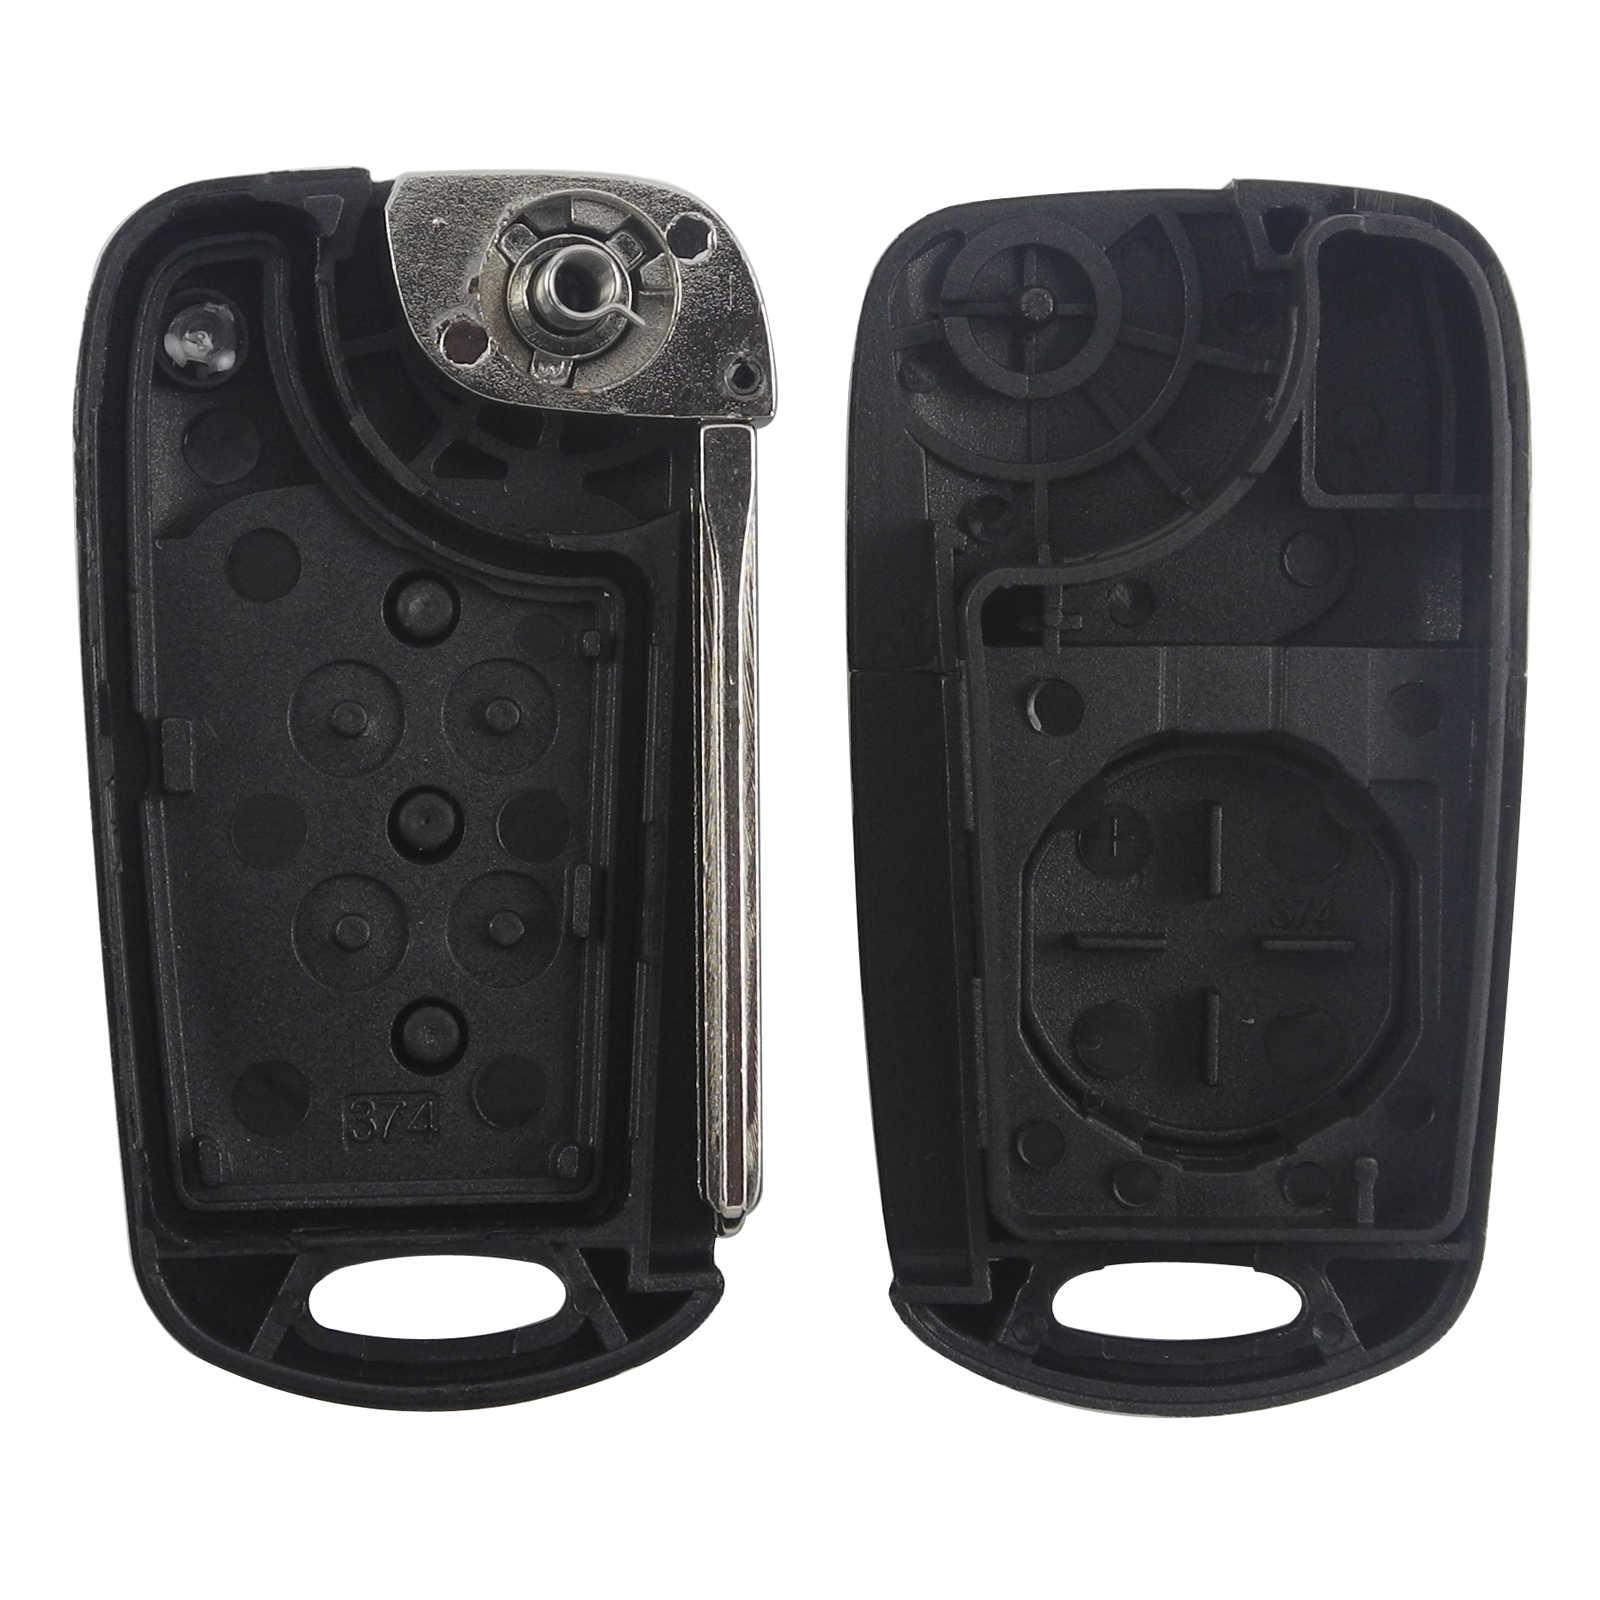 10 Pcs Jingyuqin Remote Mobil Kunci Shell Fob untuk Hyundai Solaris Bisa 2011 2012 2013 Original Case Kunci TOY40 HY20R Pisau 3BTN